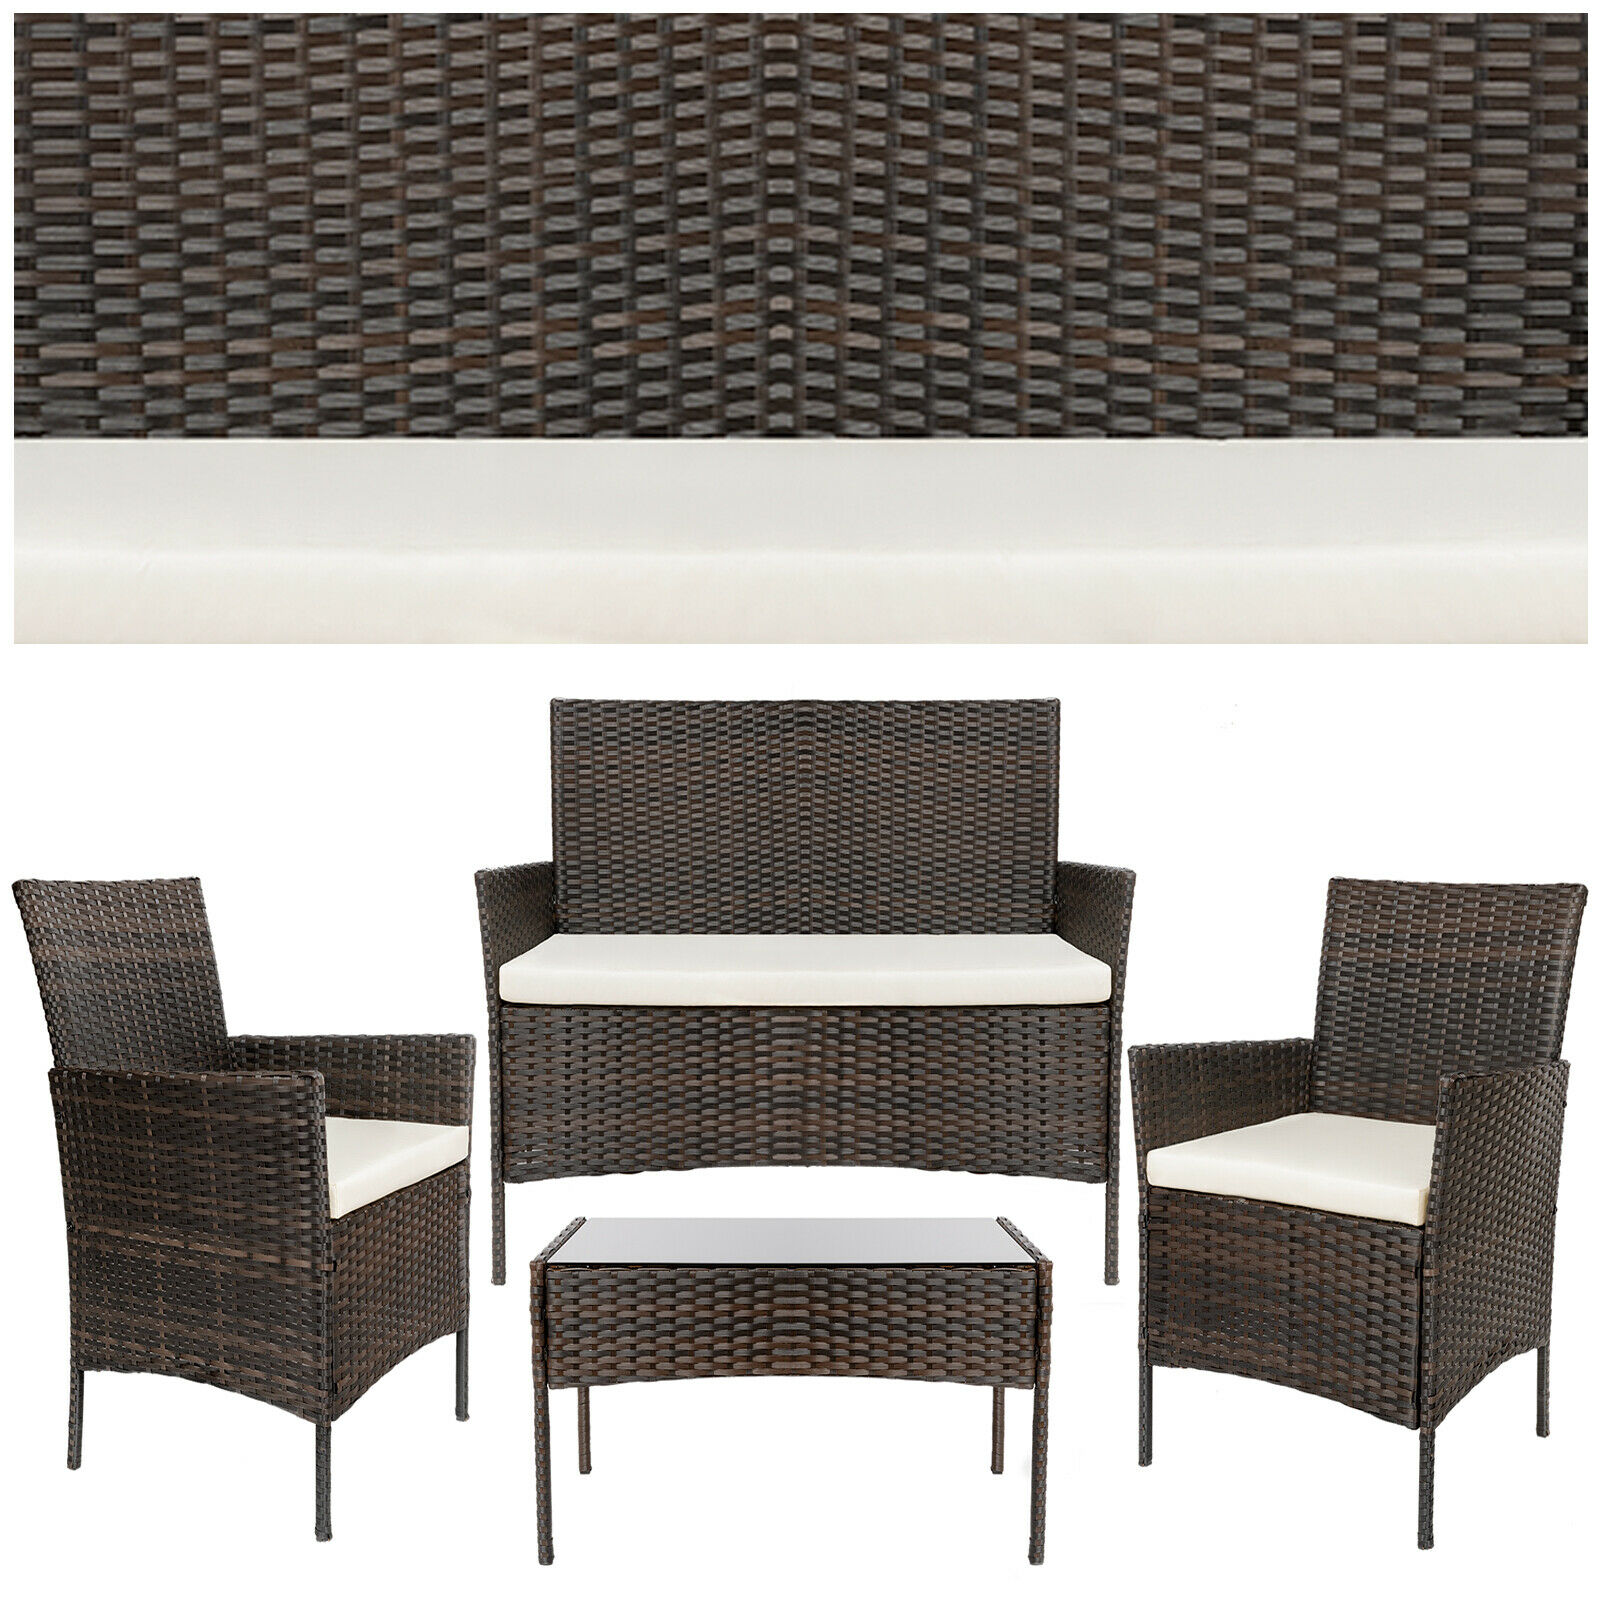 Garden Furniture - Luxury ratan garden furniture, outdoor 2-seater sofa + 2 armchairs + table